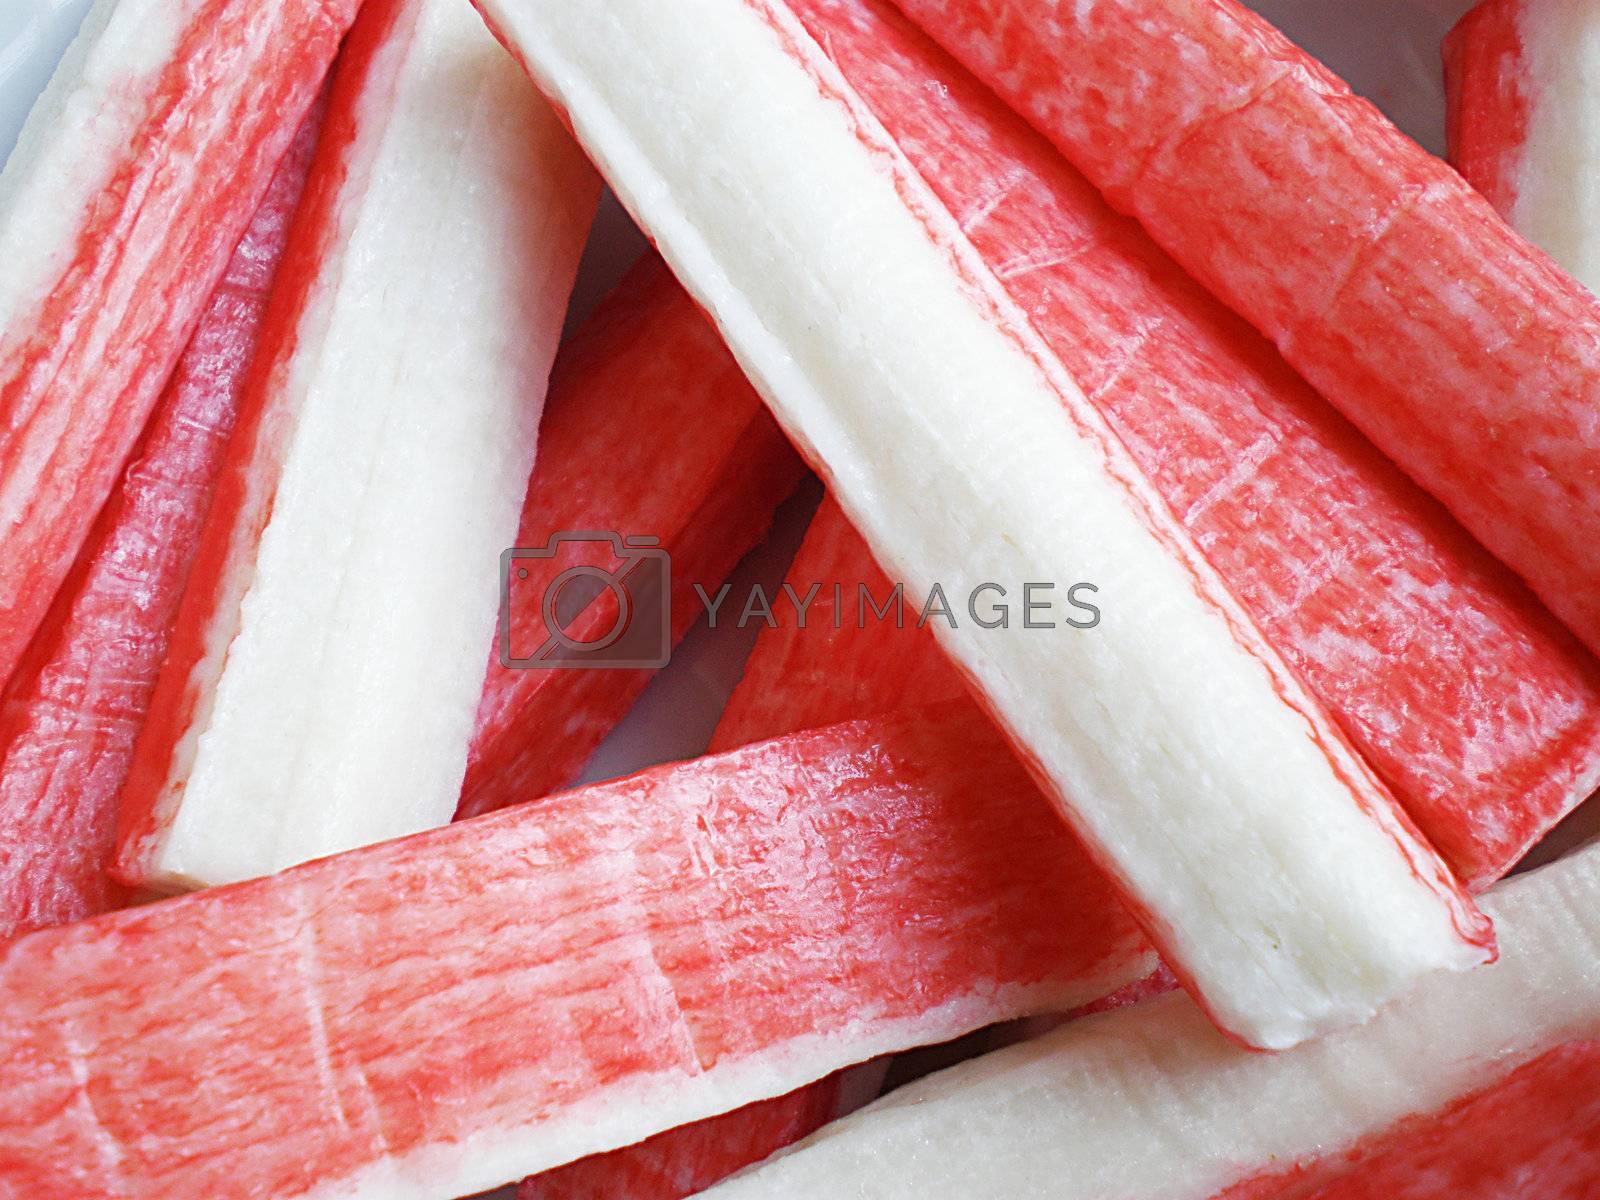 Royalty free image of crab sticks by Dessie_bg